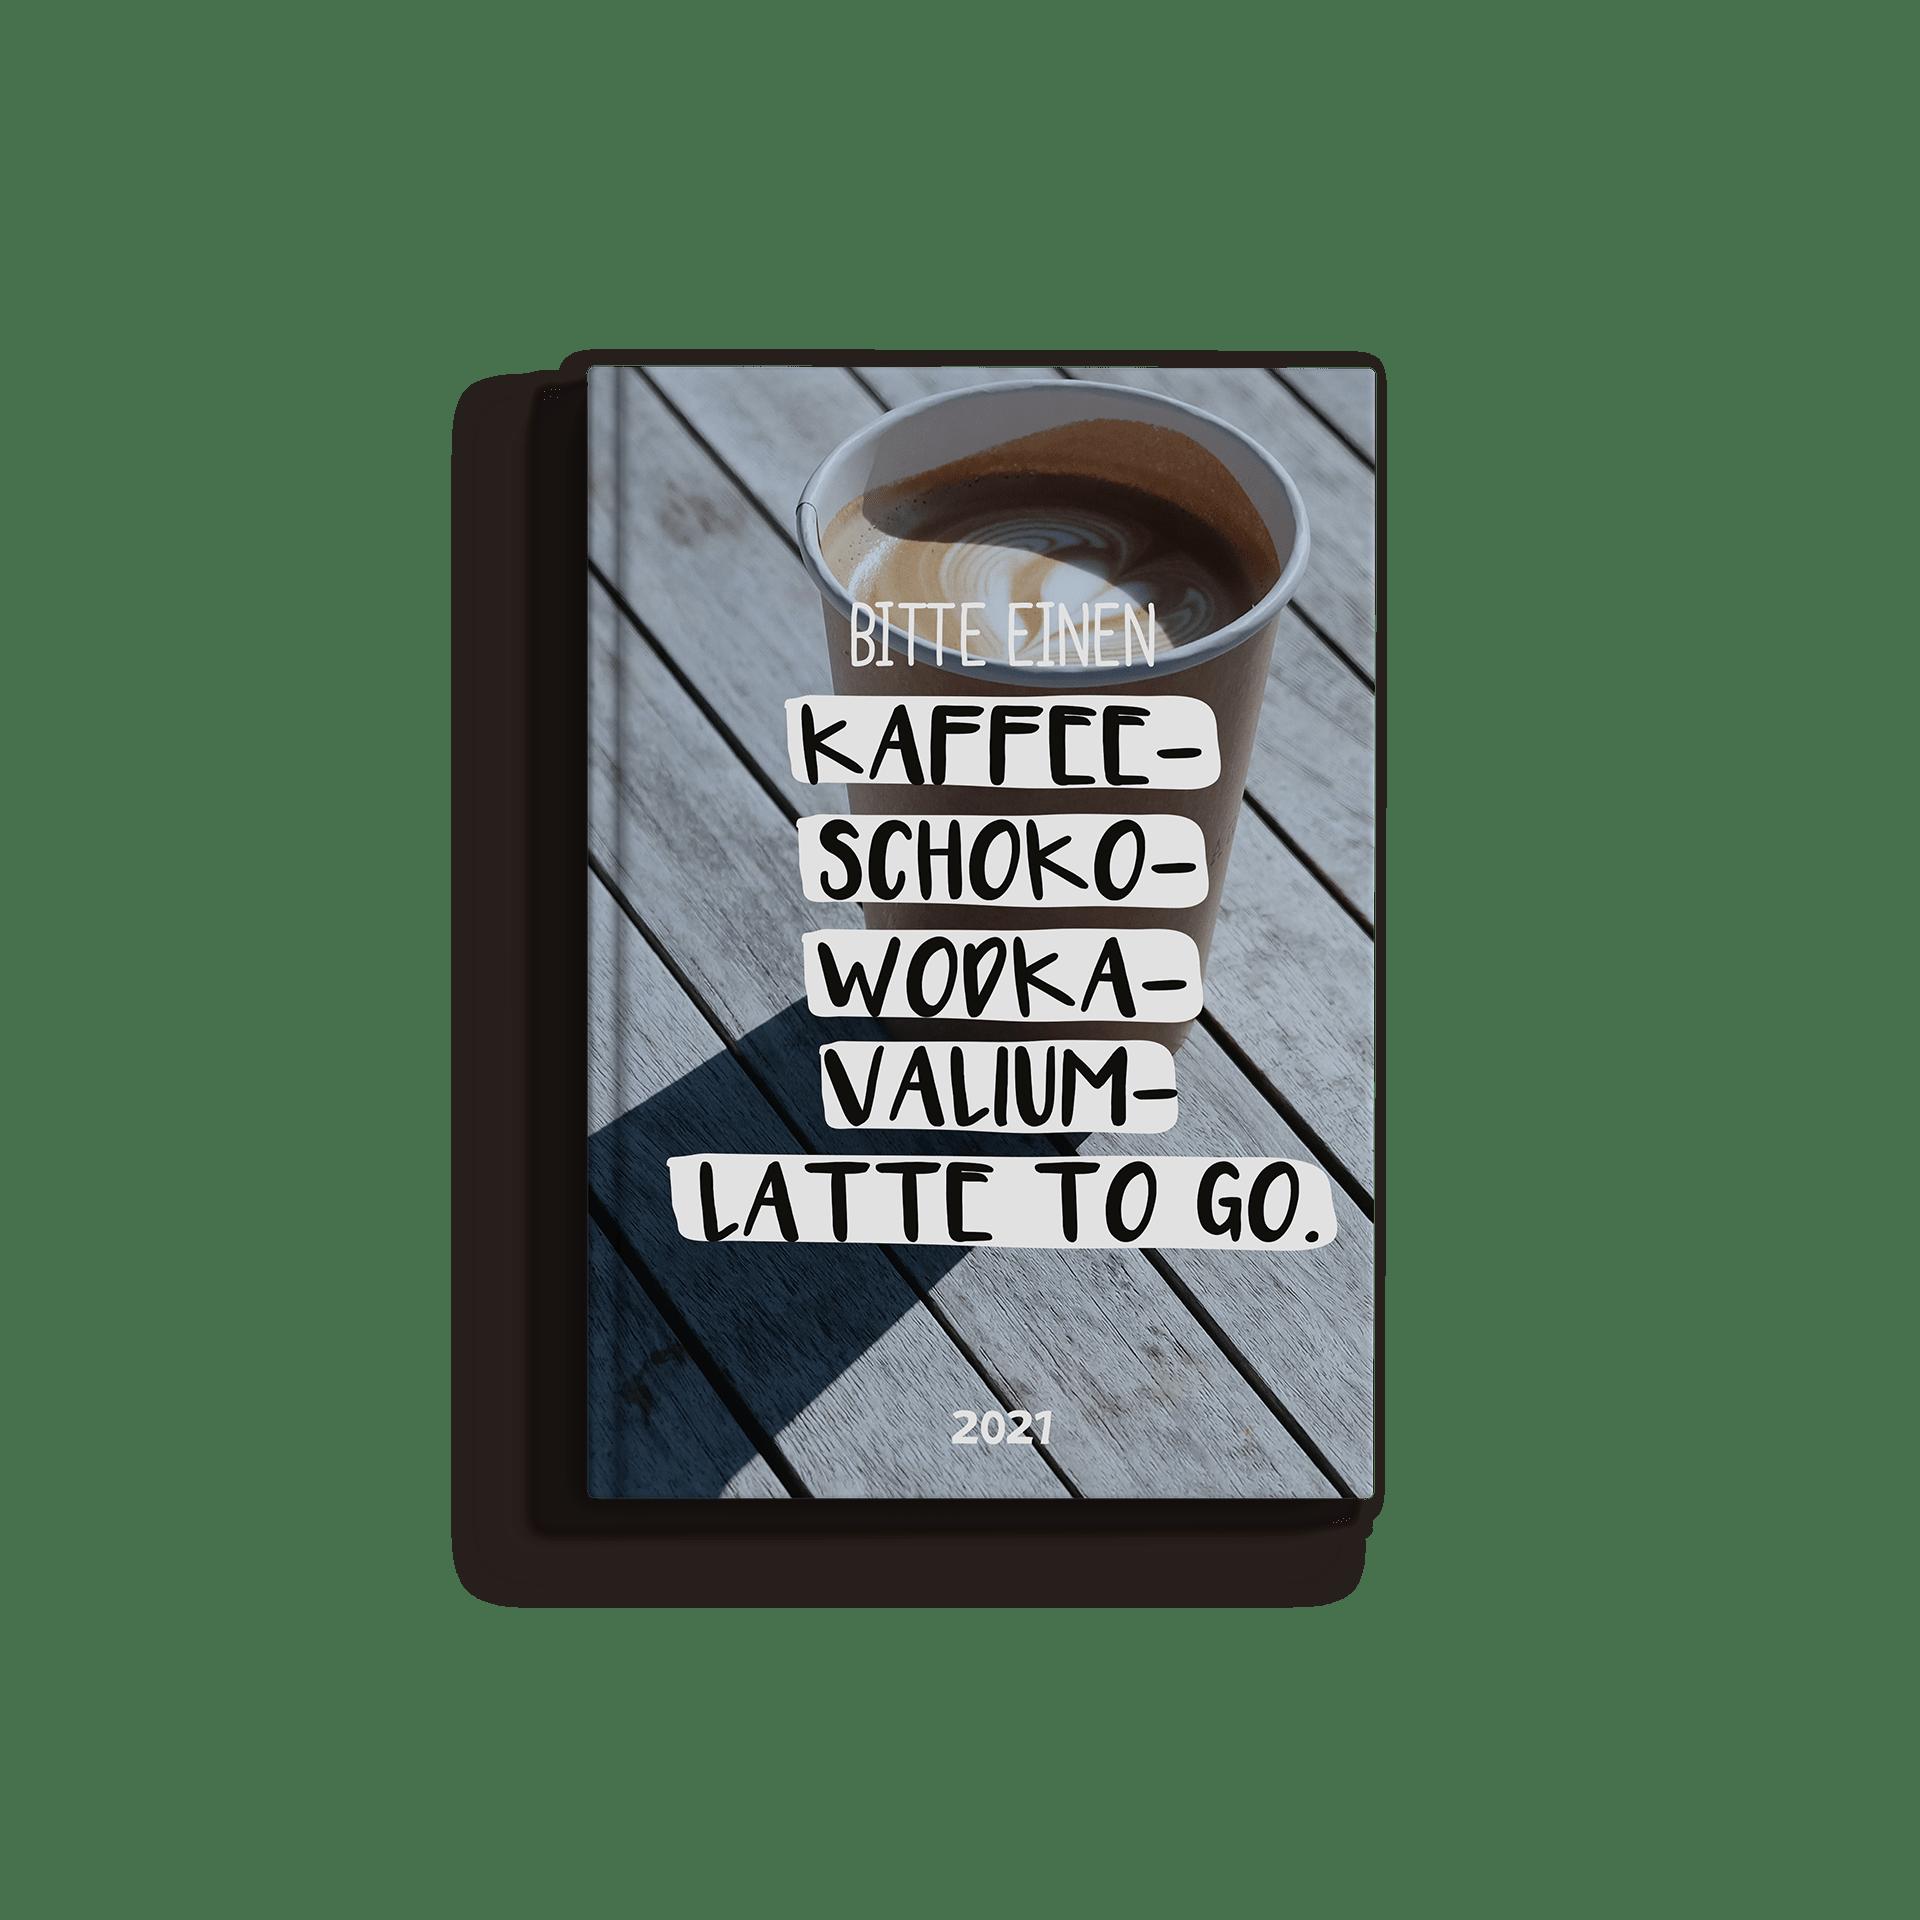 Latte-to-Go - Terminplaner